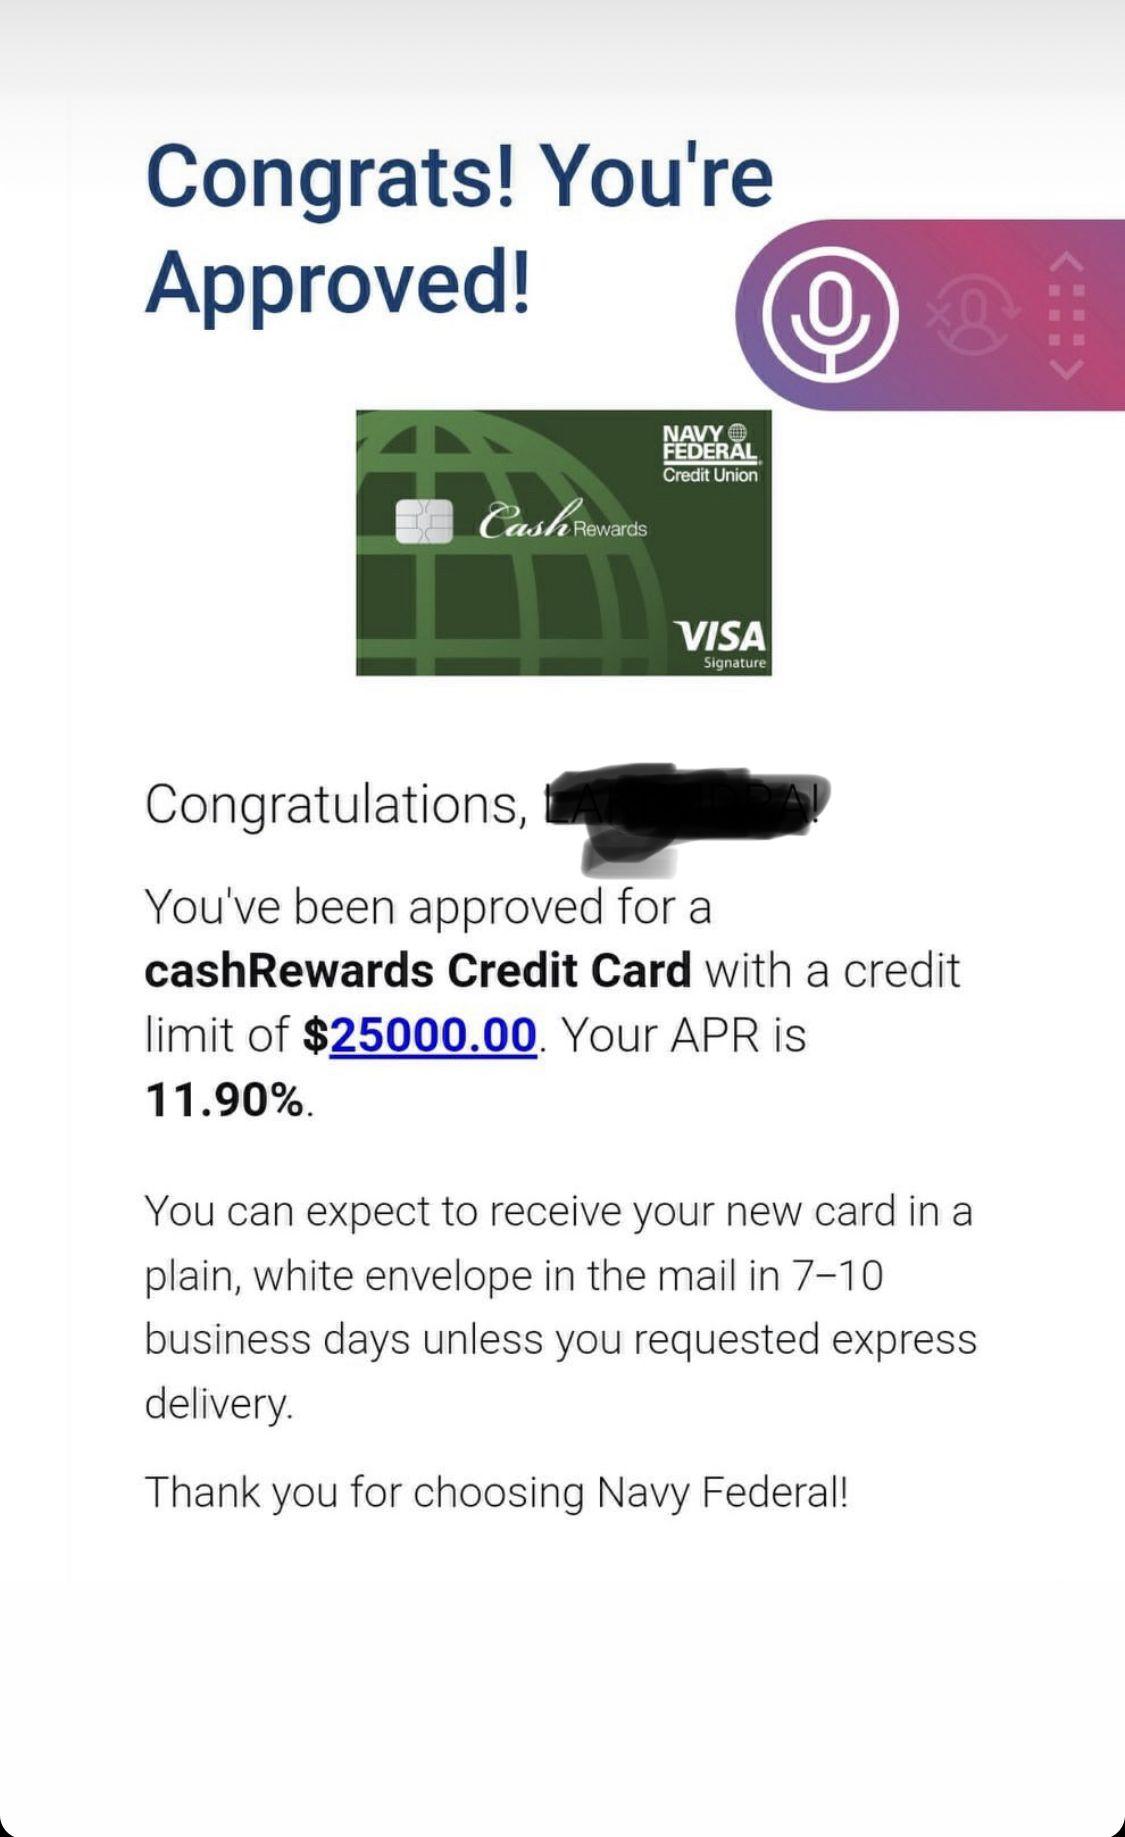 My Clients Get Approved Www Creditdemolition Com Let Us Restore Your Credit Credit Restoration Credit Card Congrats